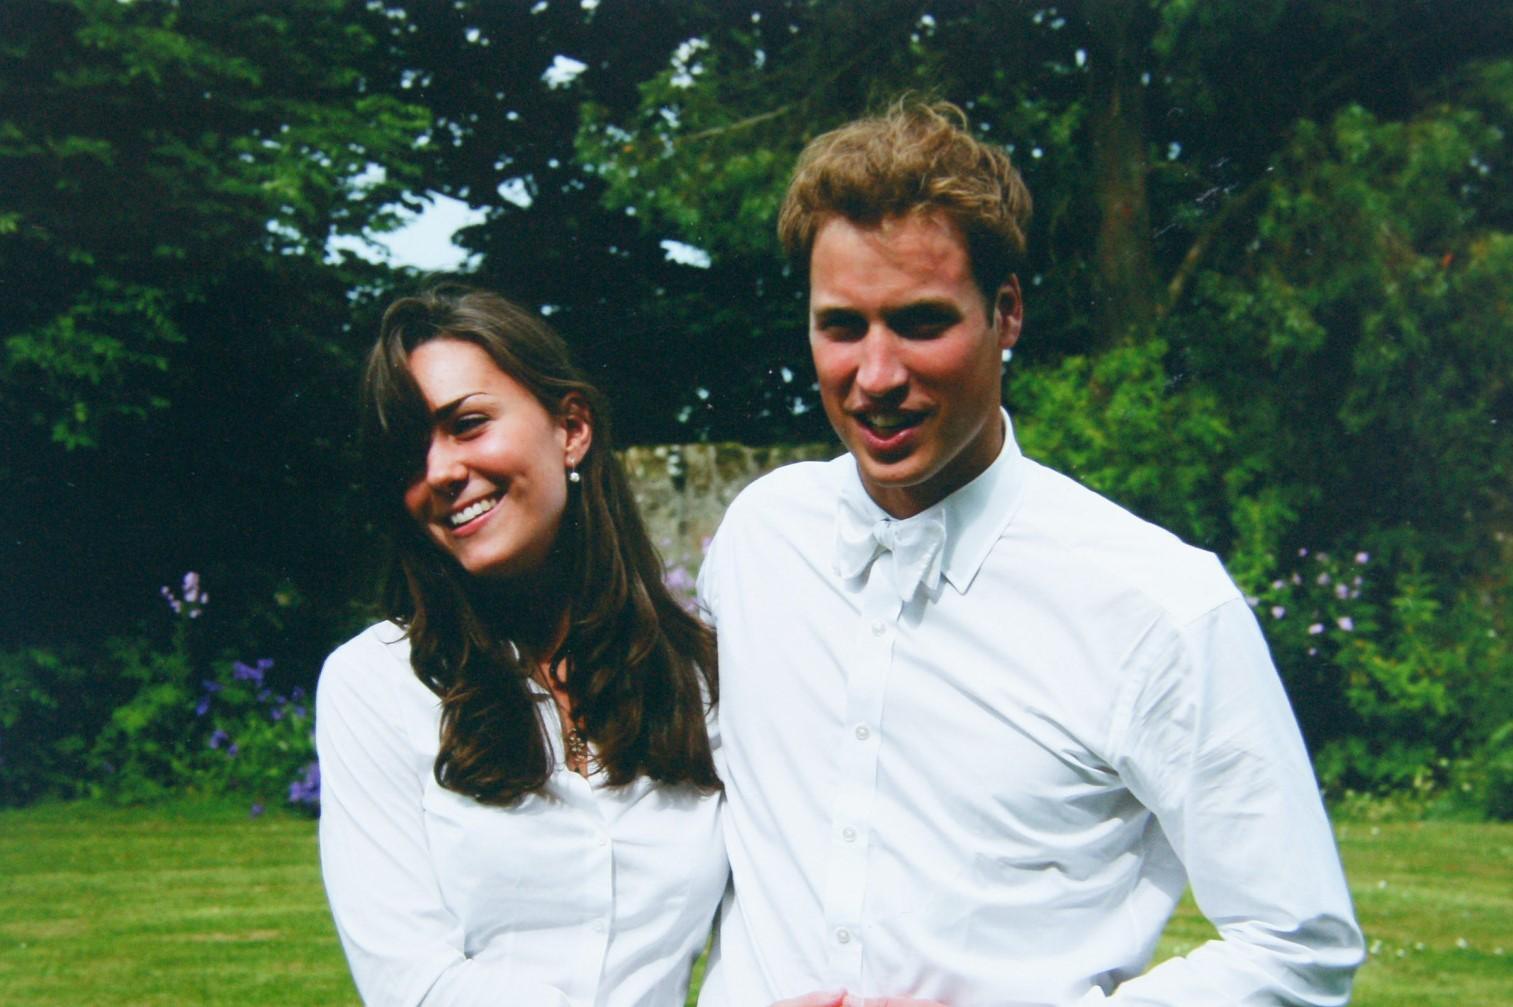 Kate middleton et william leur rencontre